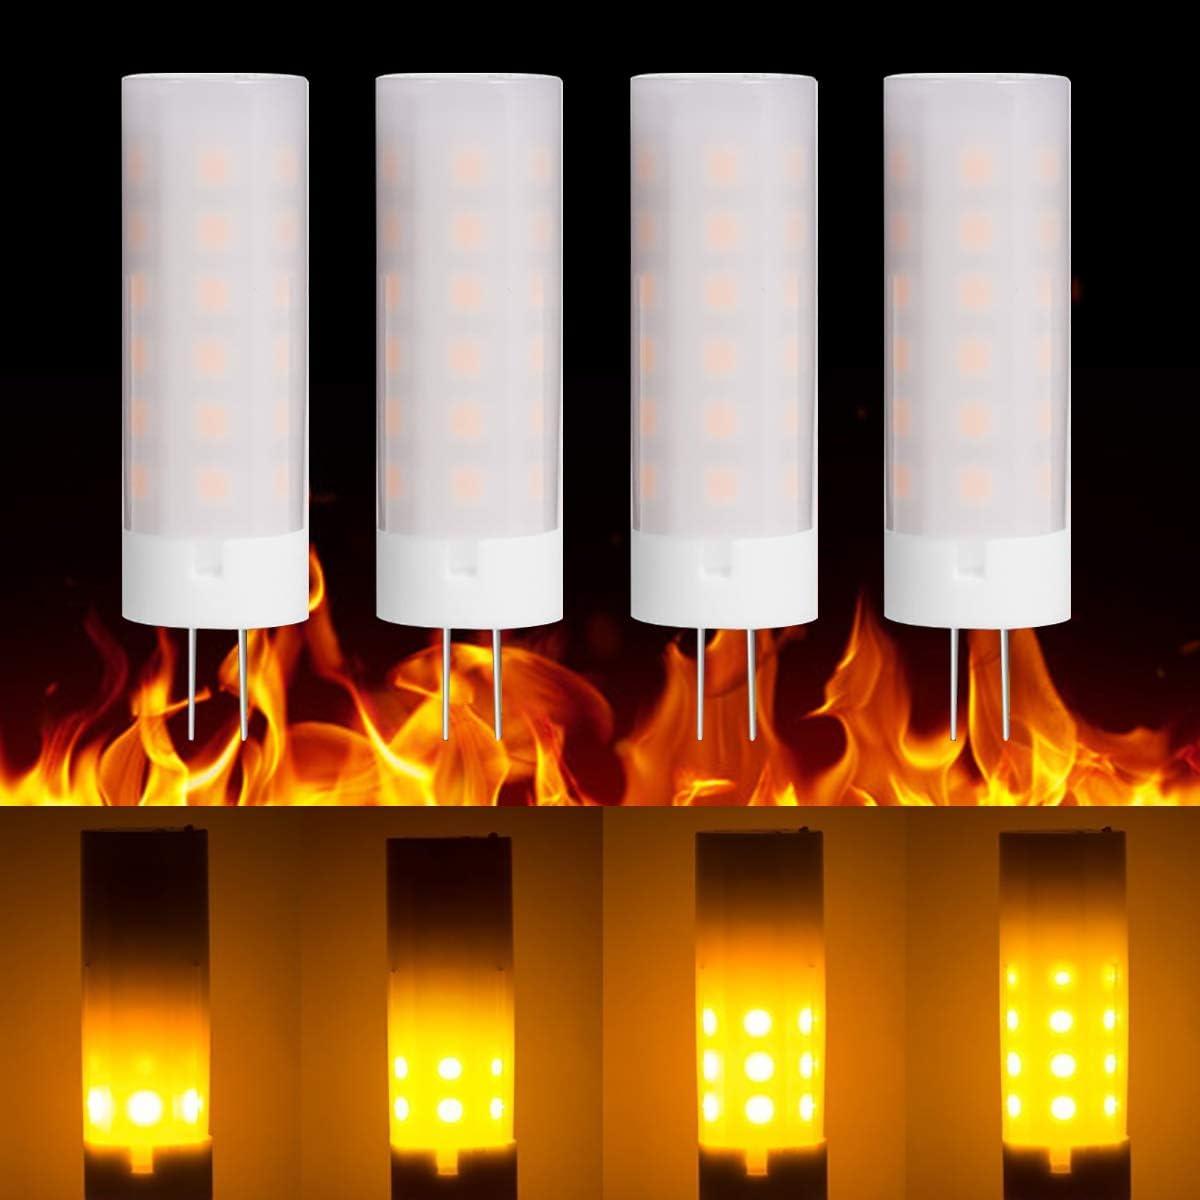 Luz de llama Base LED G4 2W Bombillas de efecto de fuego 36LEDs 2835 SMD DC 8-30V Fuego parpadeante Bombillas LED Iluminación simulada Estufa de leña Vela Campamento Influencia